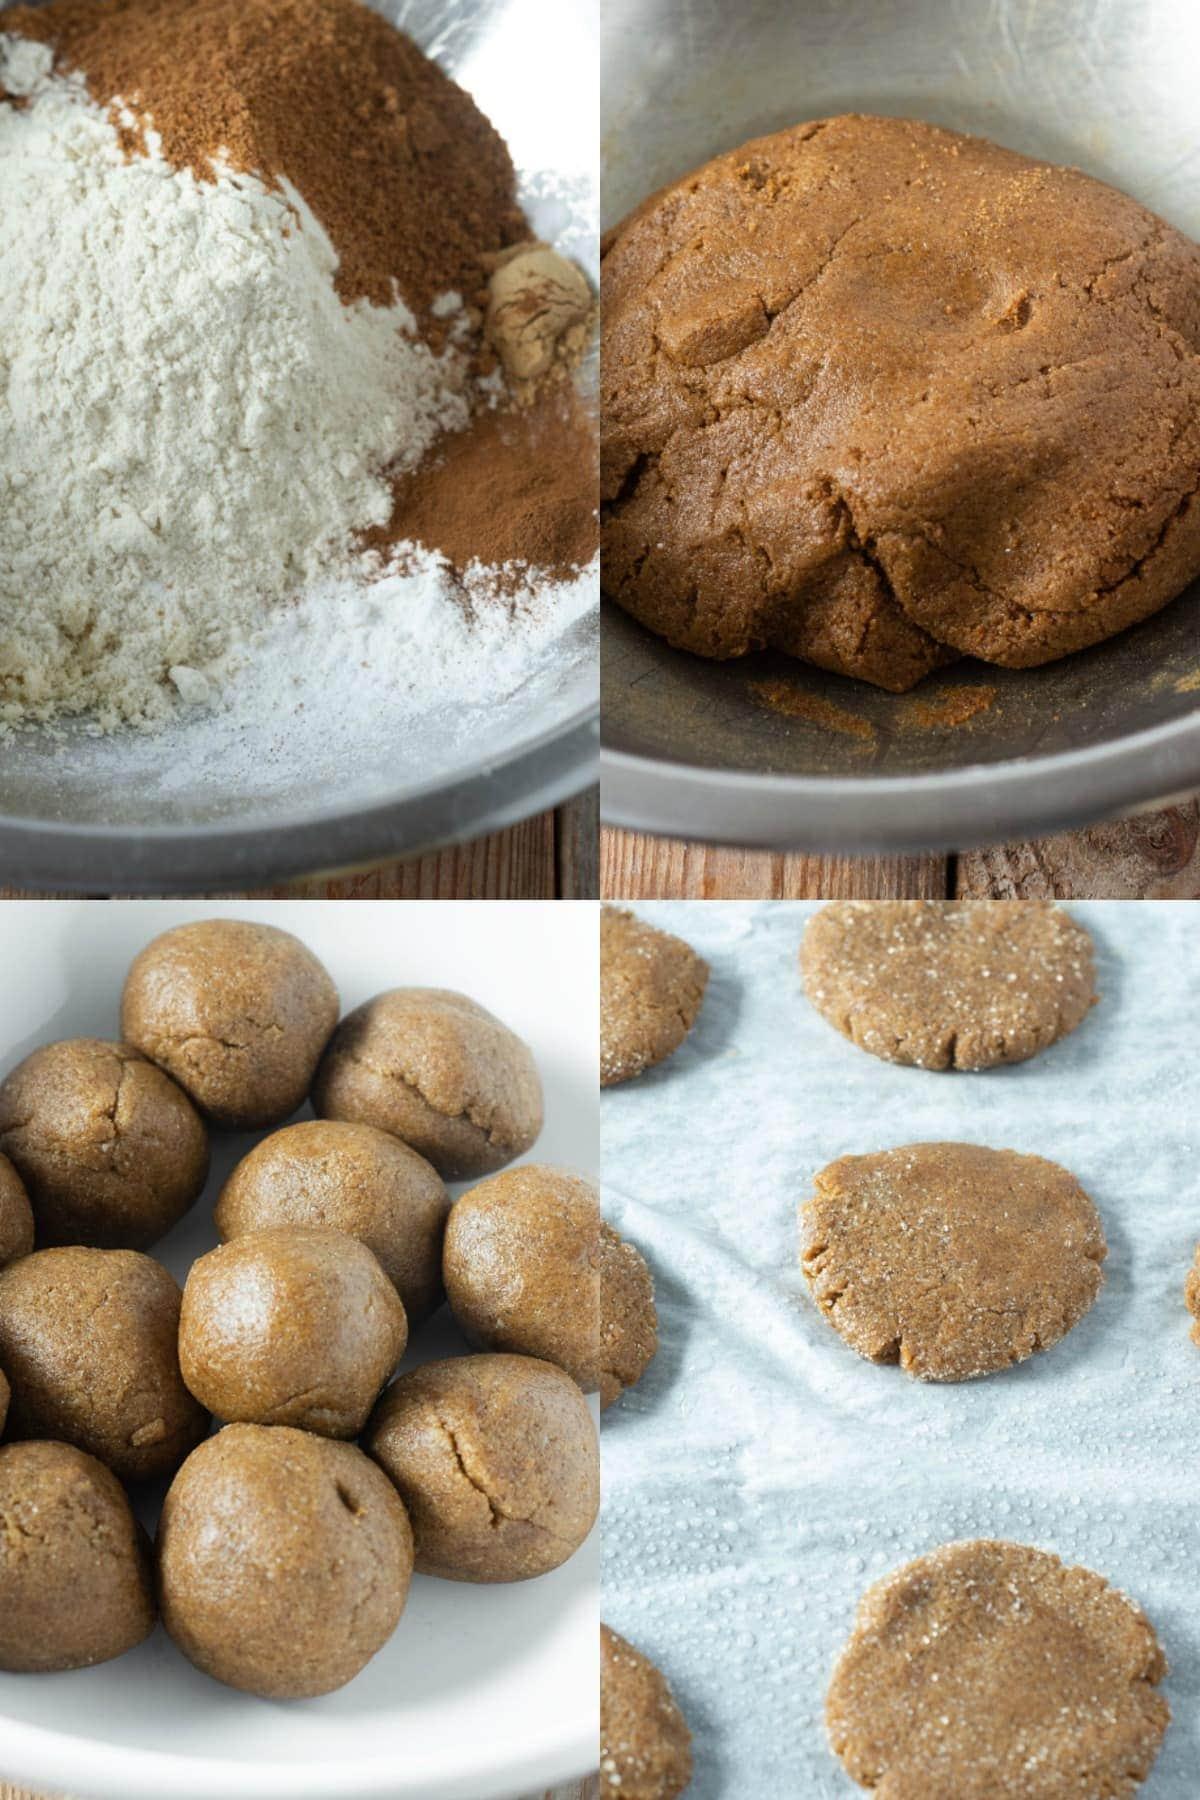 Vegan molasses cookies process shots of the steps